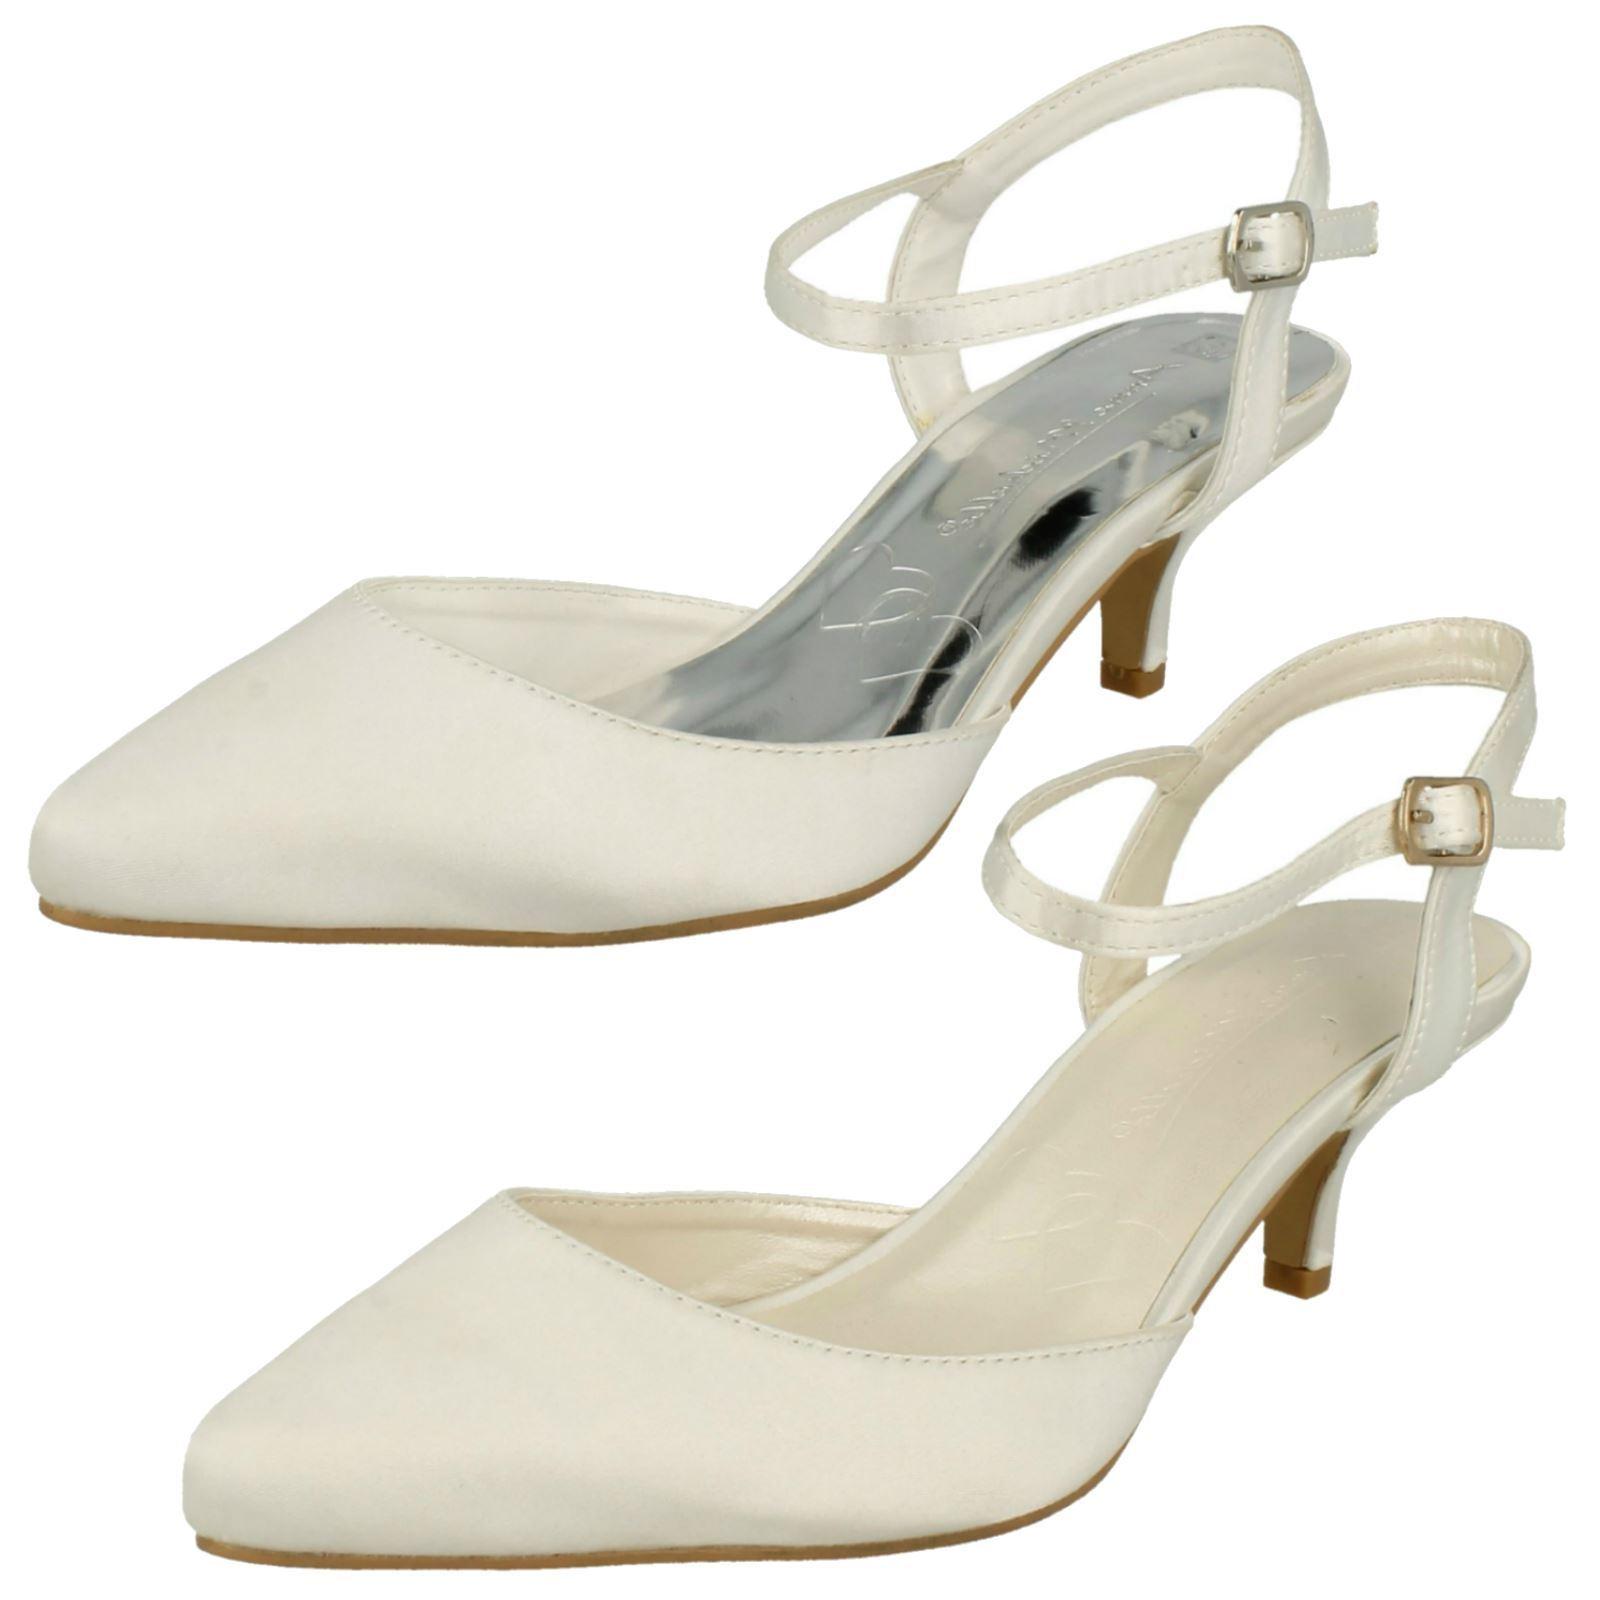 Ladies Anne Michelle Buckle Up shoes